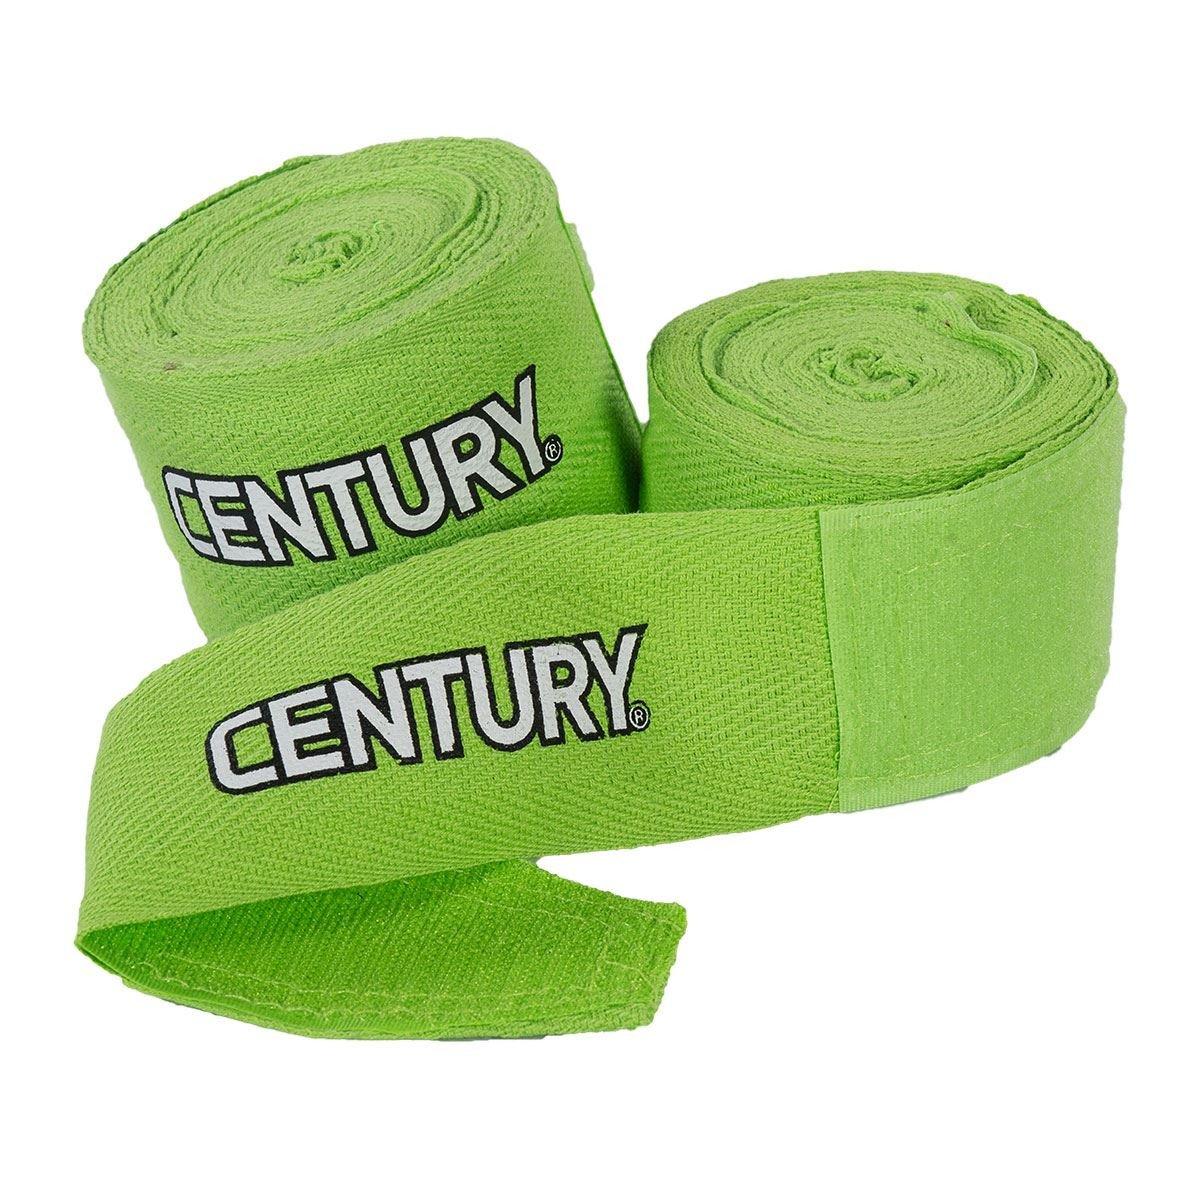 Century 108 Stretch Hand Wrap c1409